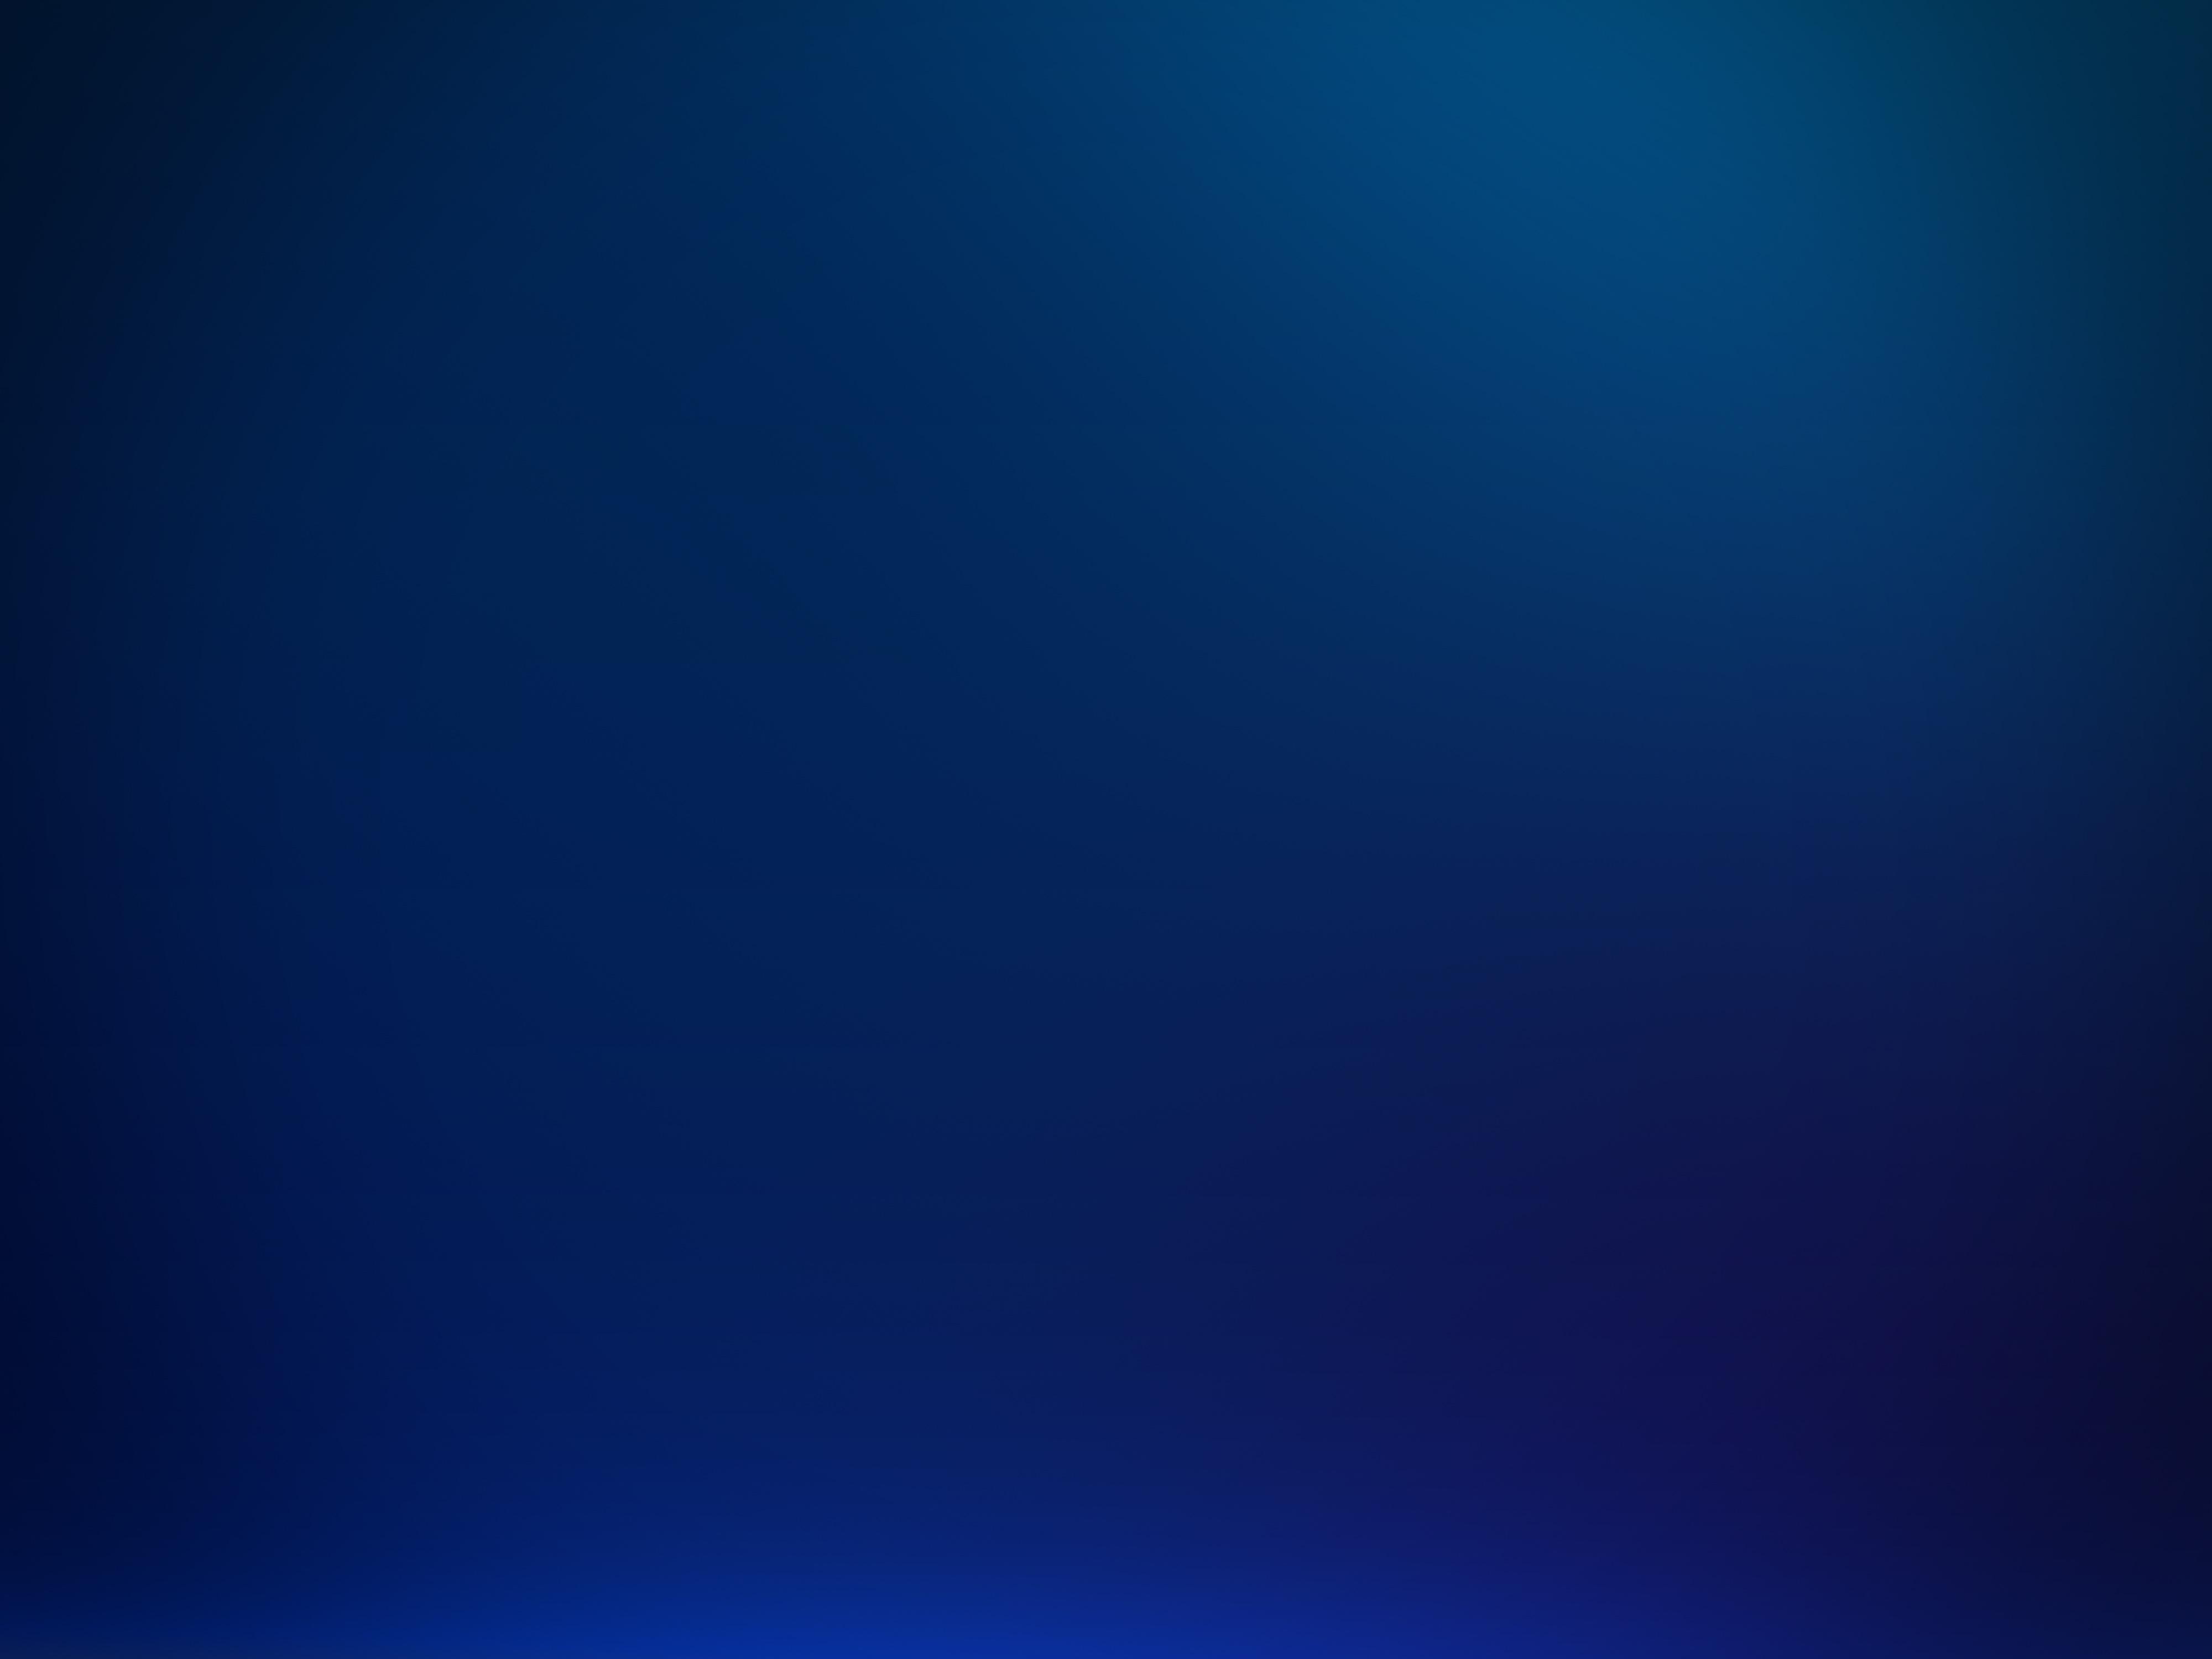 Wallpapers Hd Azul: Wallpaper Azules En [3d] Y [hd